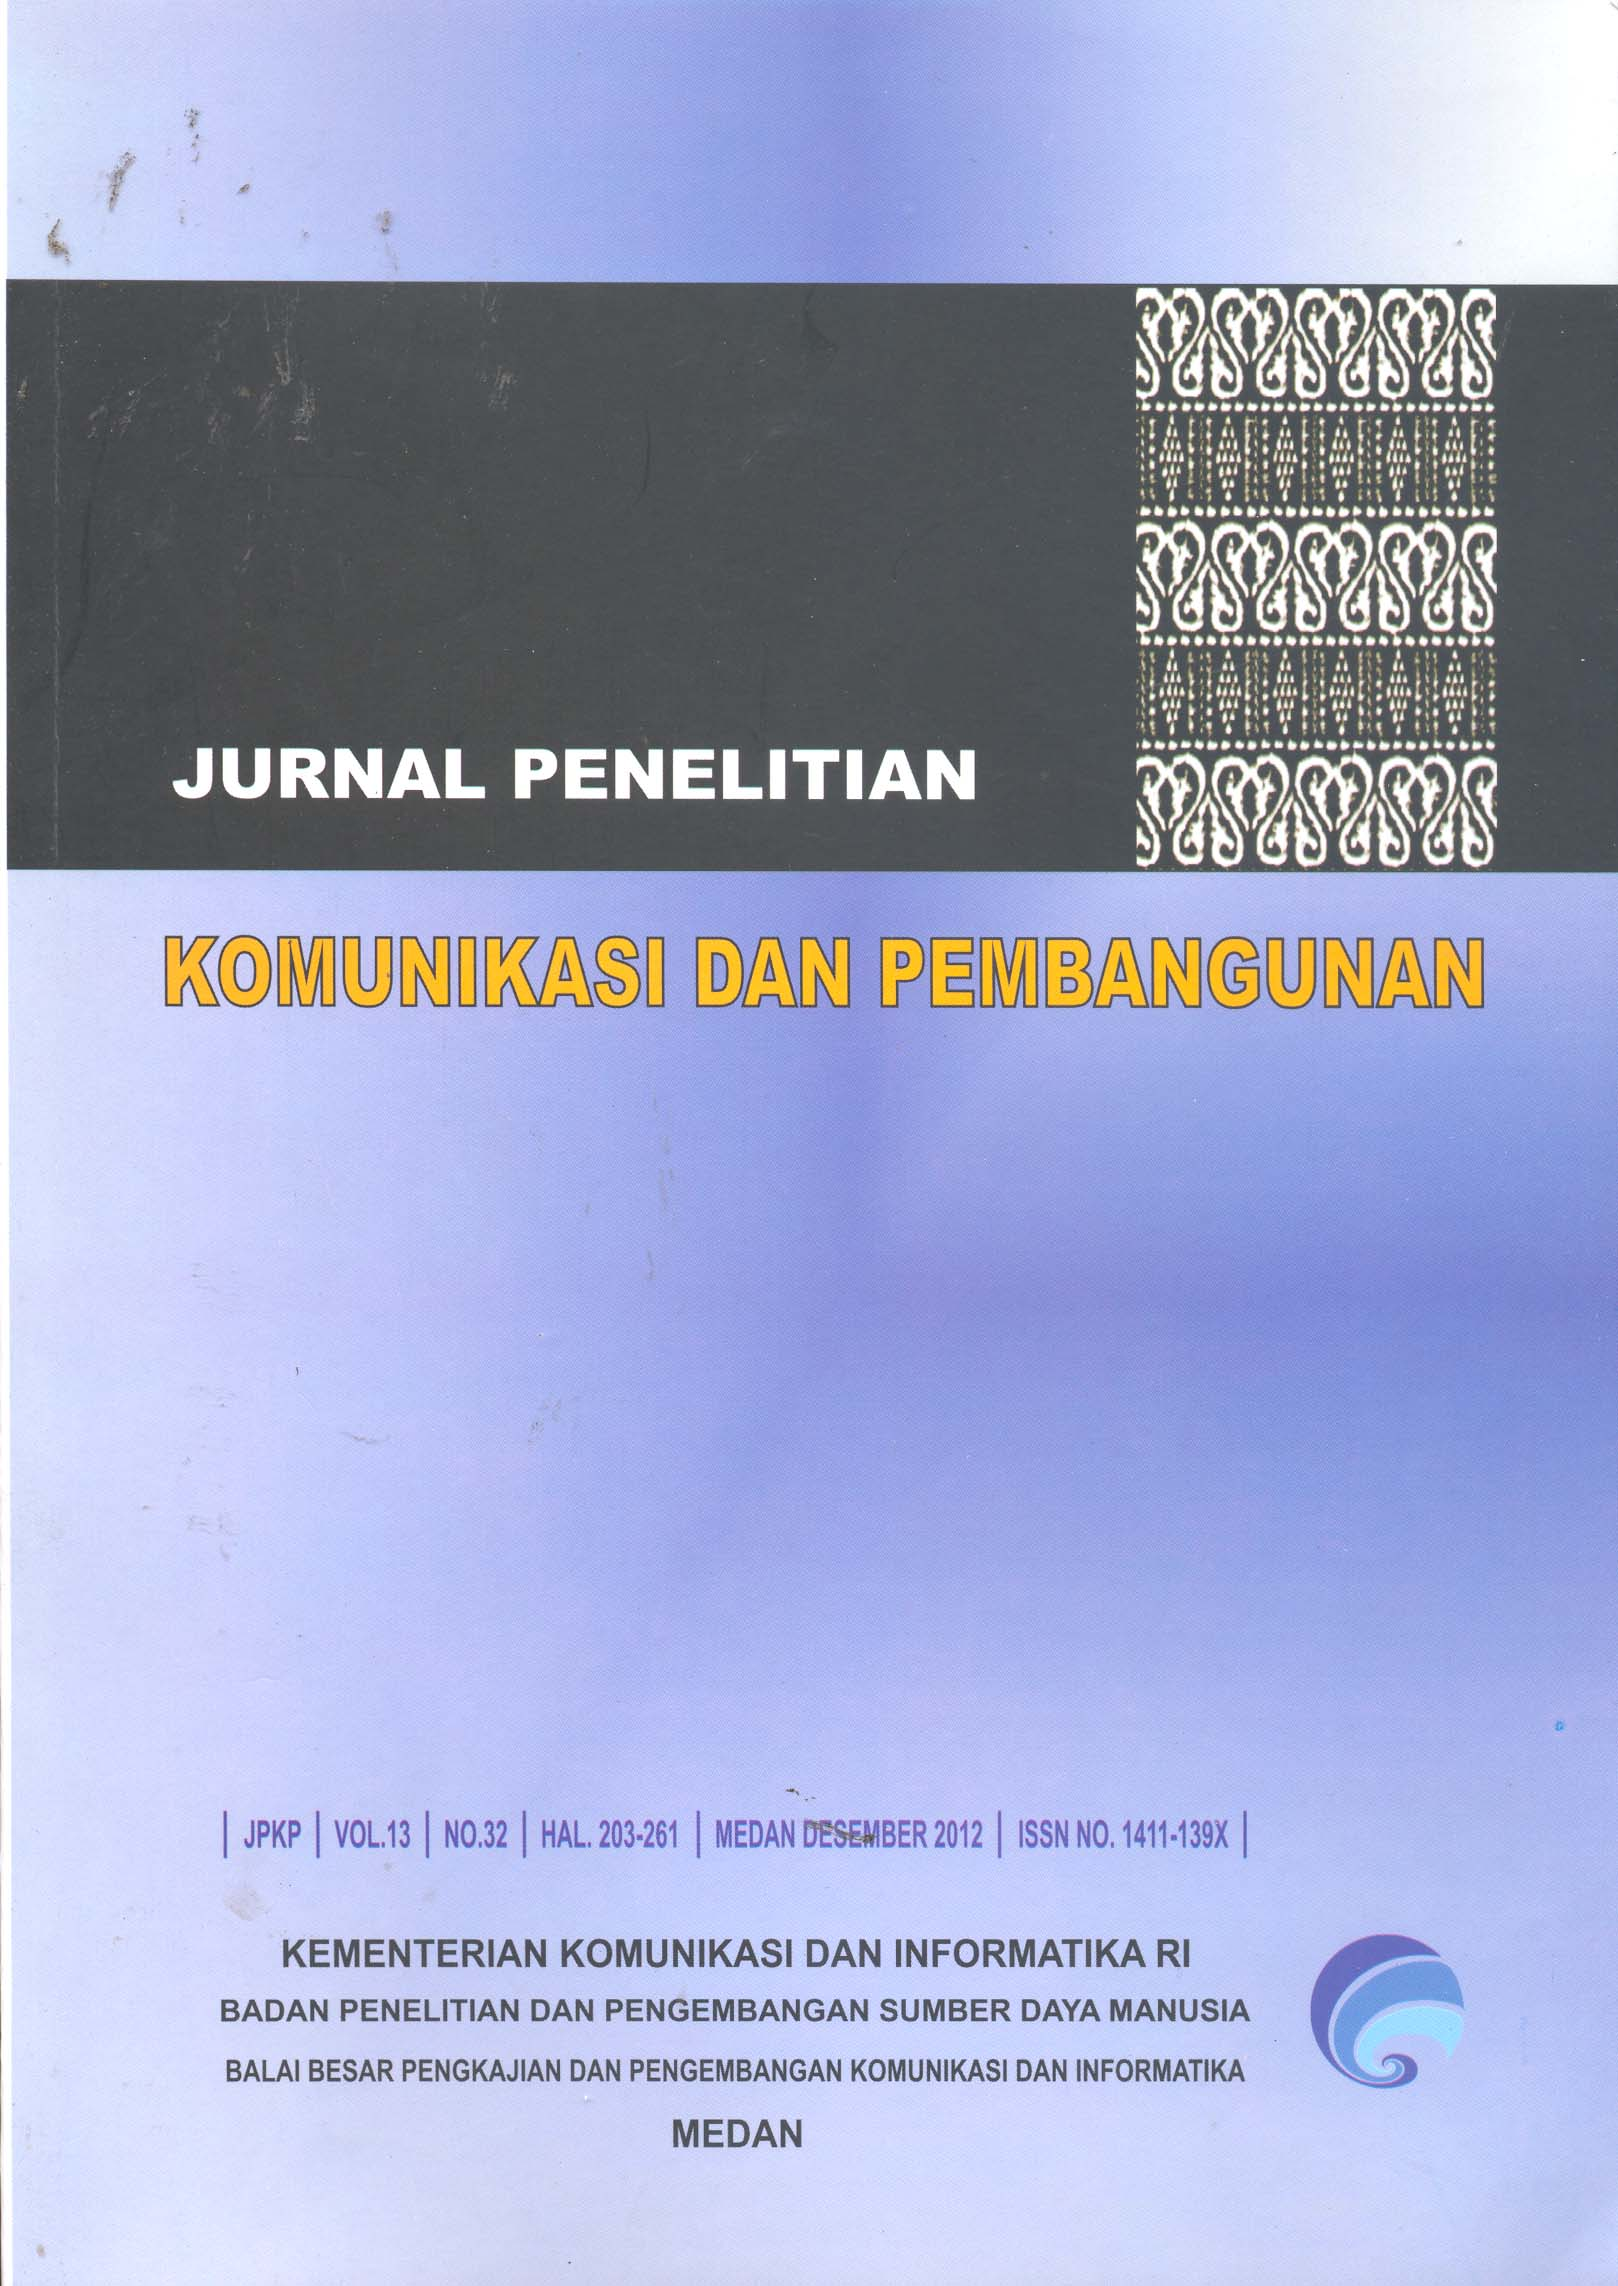 Jurnal Penelitian Komunikasi dan Pembangunan